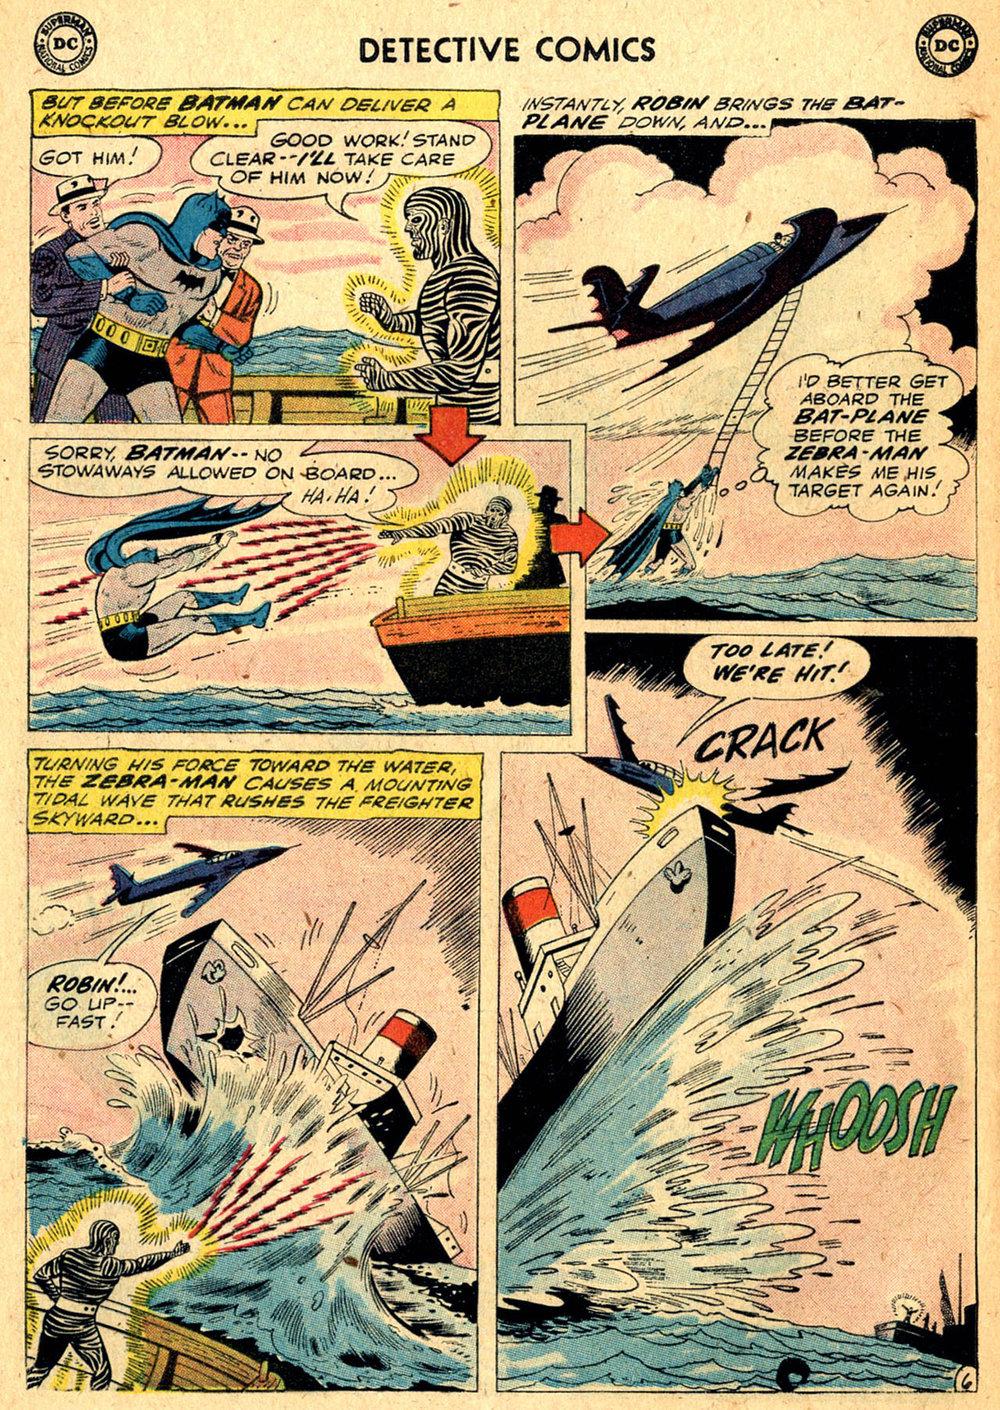 Detective Comics (1937) 275 8.jpg